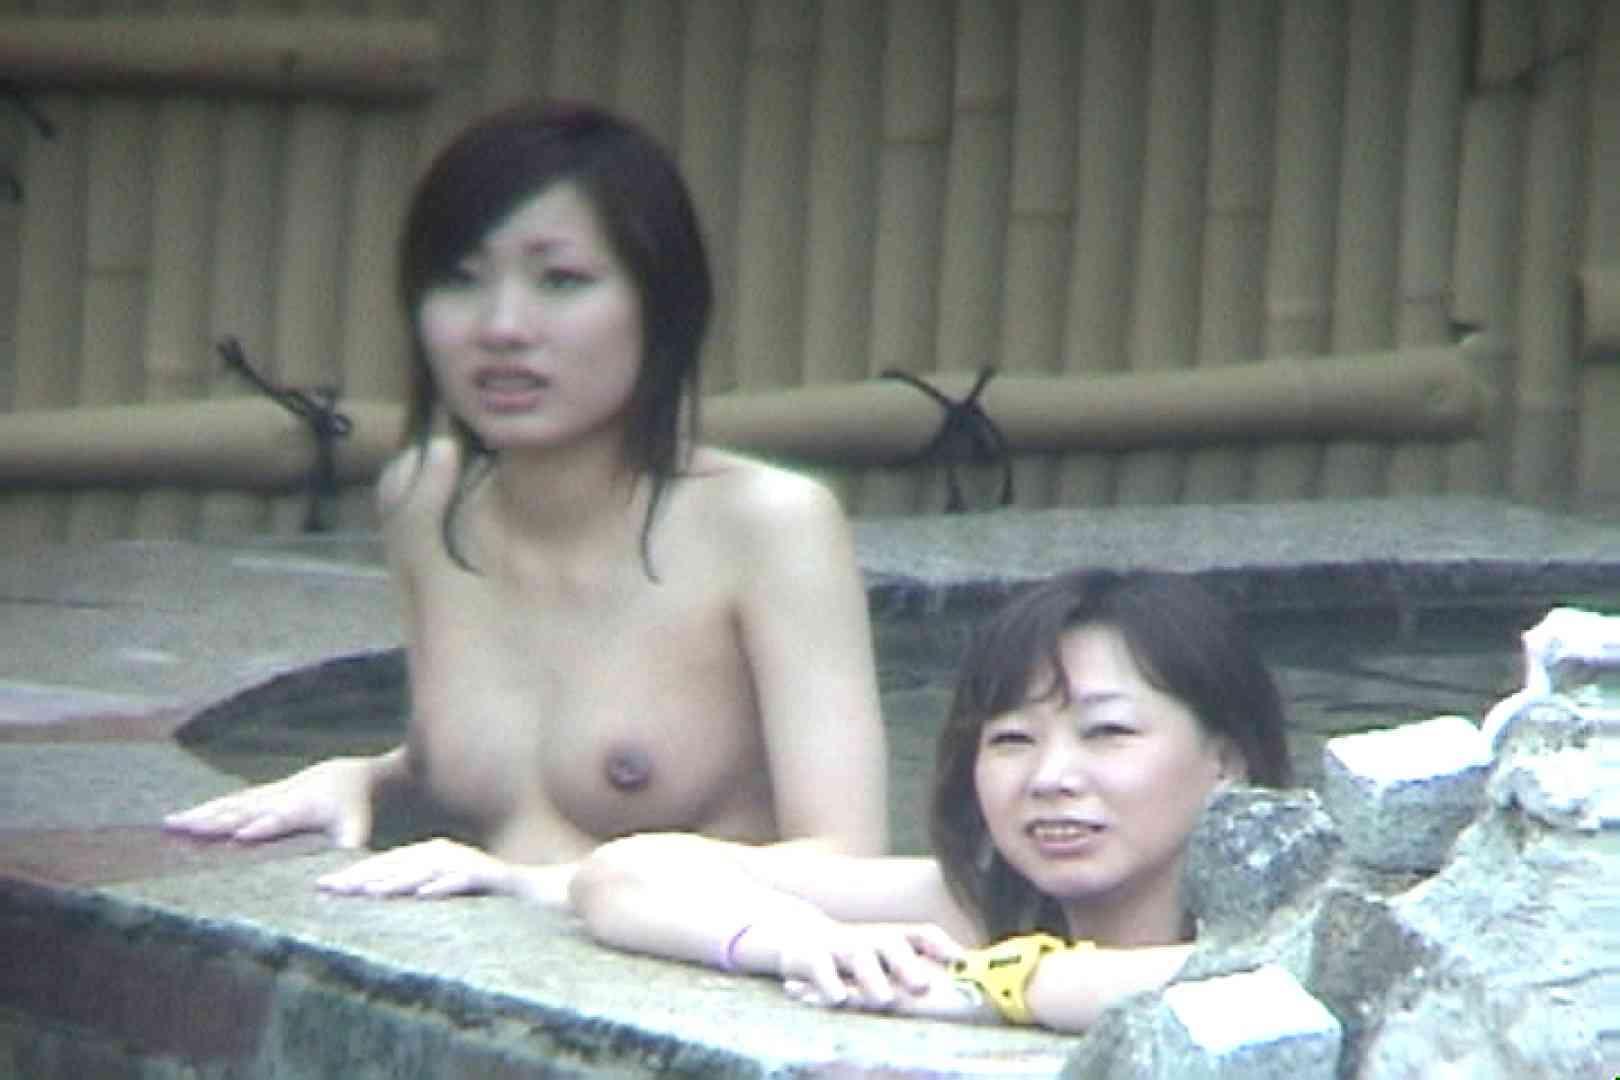 Aquaな露天風呂Vol.58【VIP限定】 HなOL | 0  95pic 29